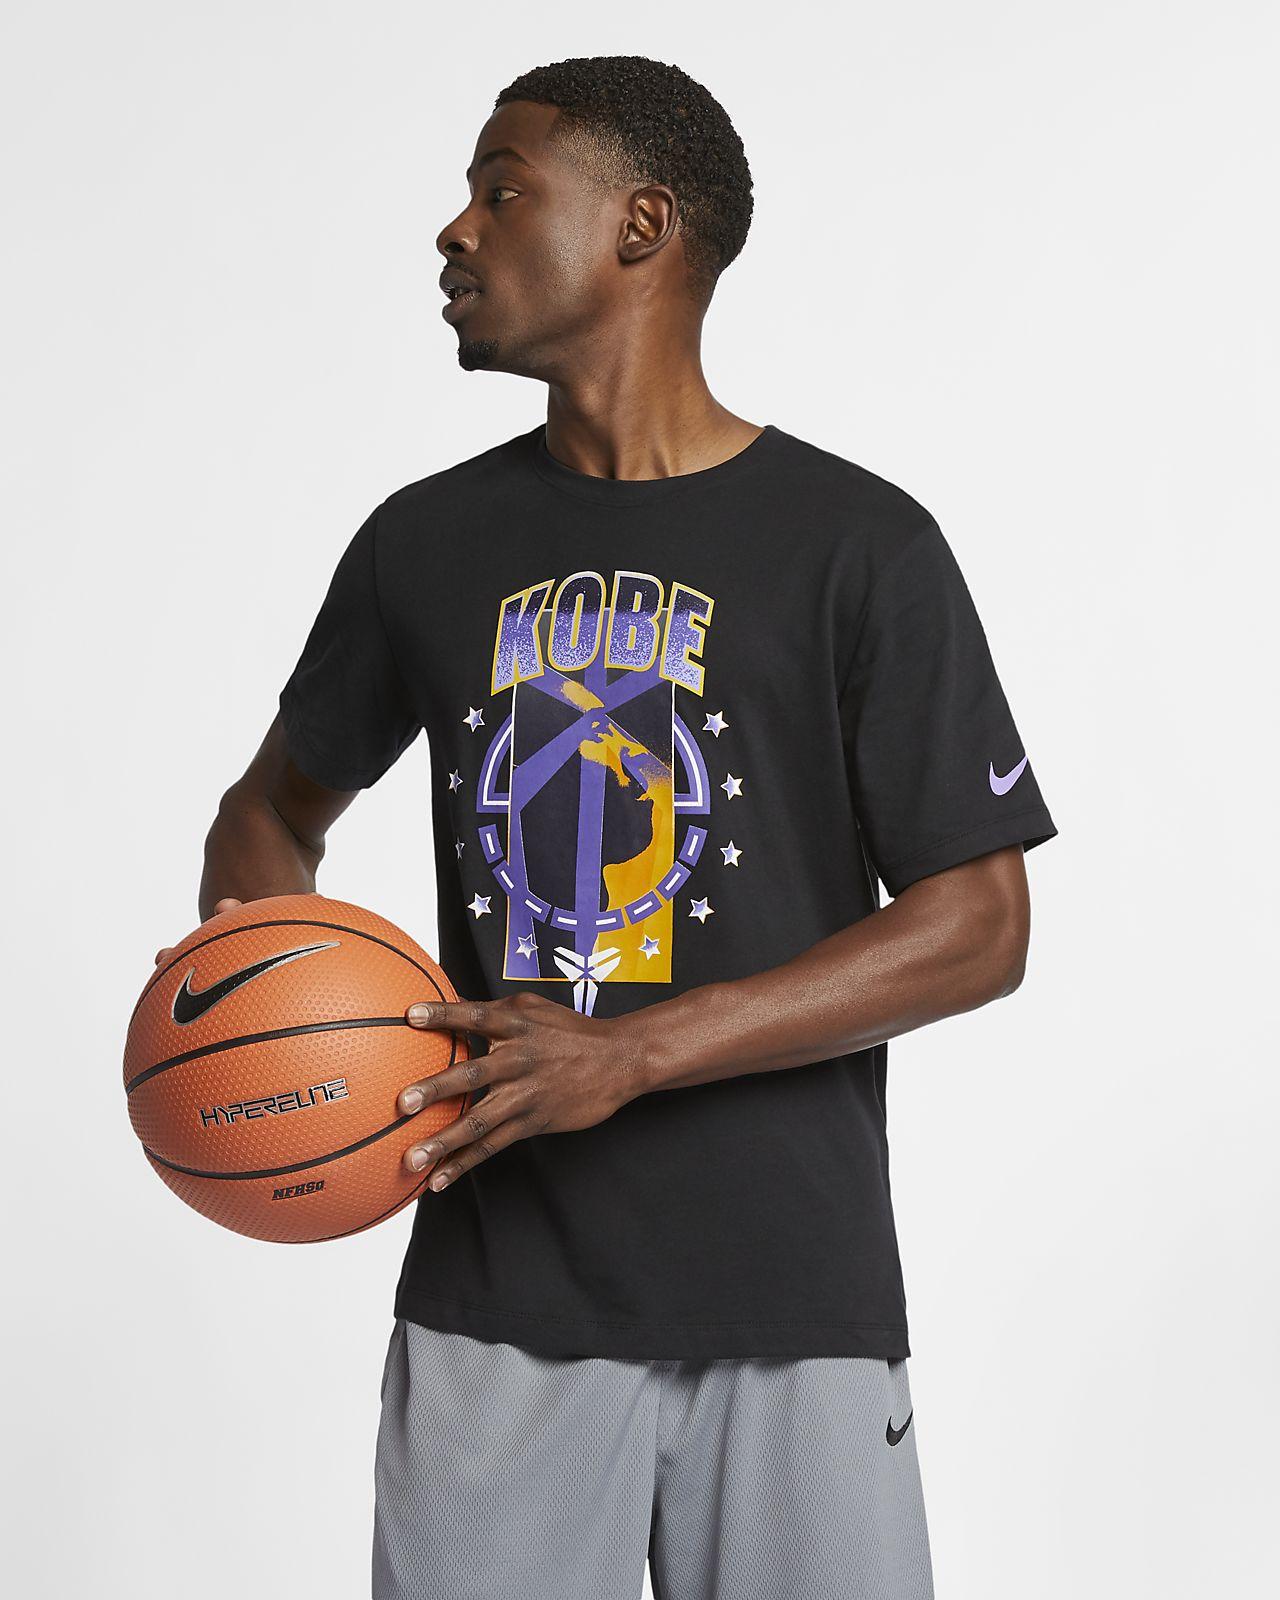 T-shirt Nike Dri-FIT Kobe för män